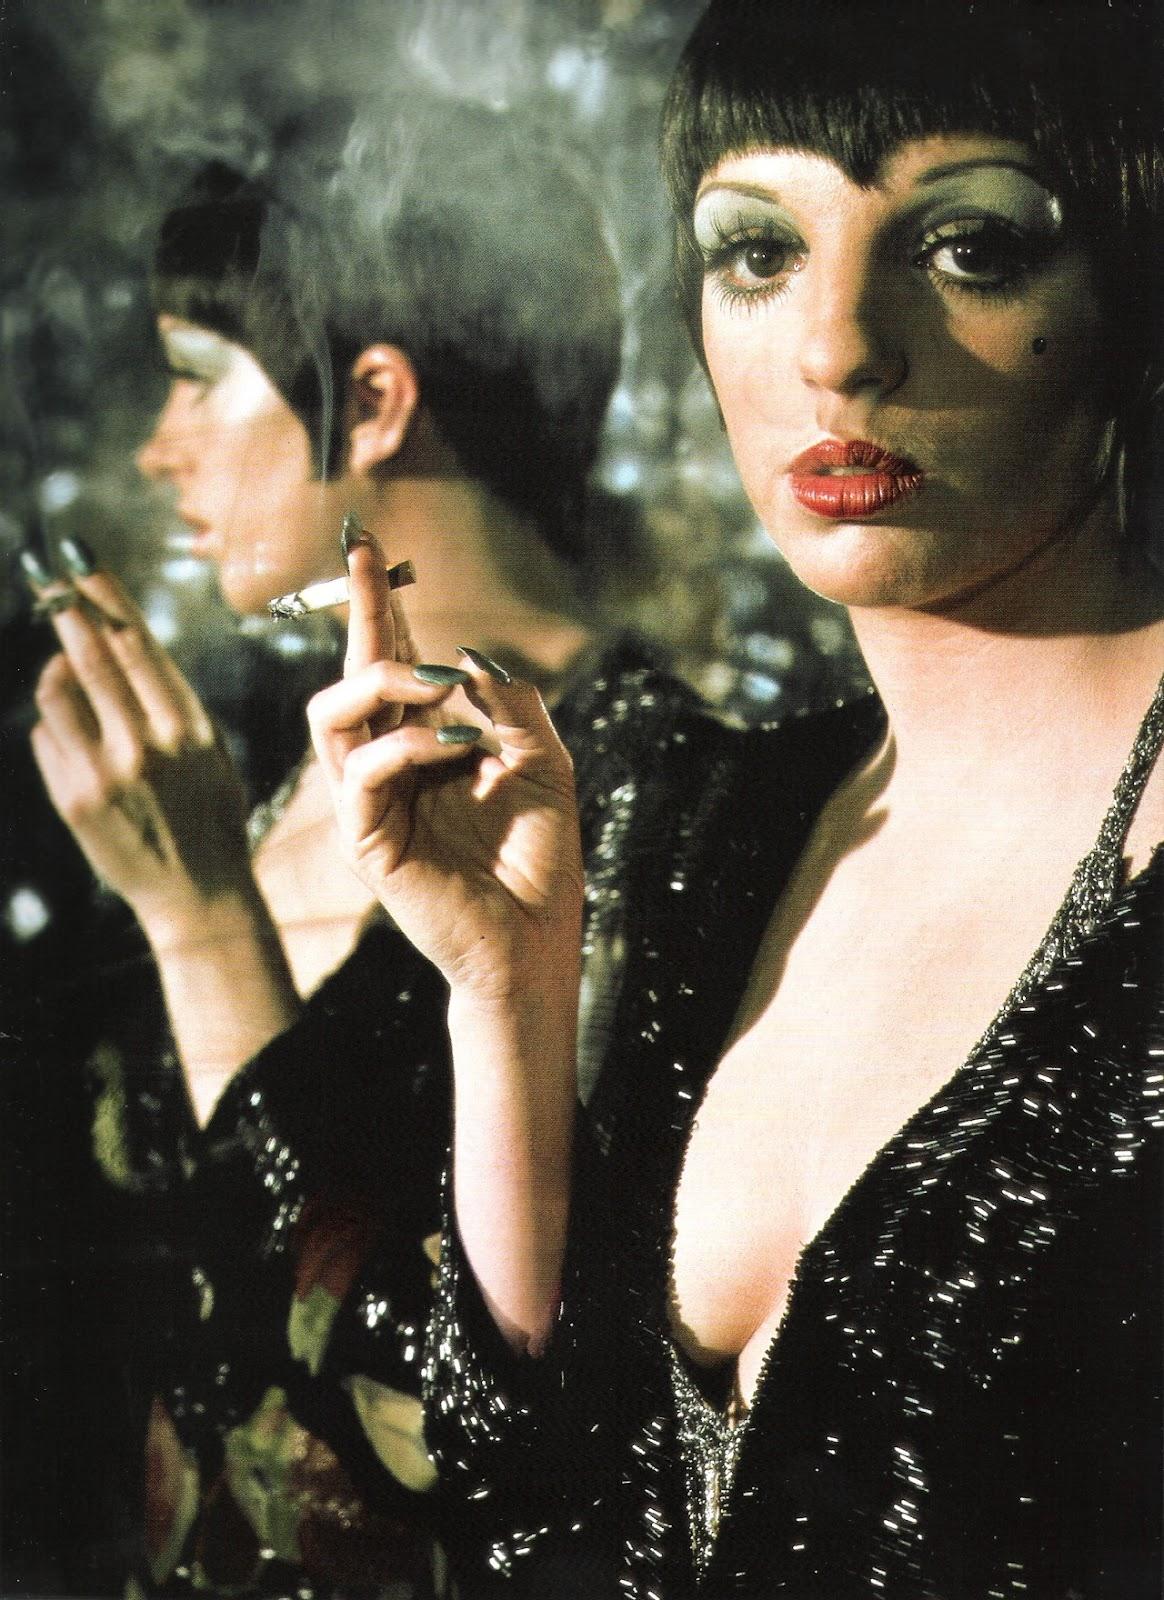 Flashback: El glamour de Liza Minnelli en los '70